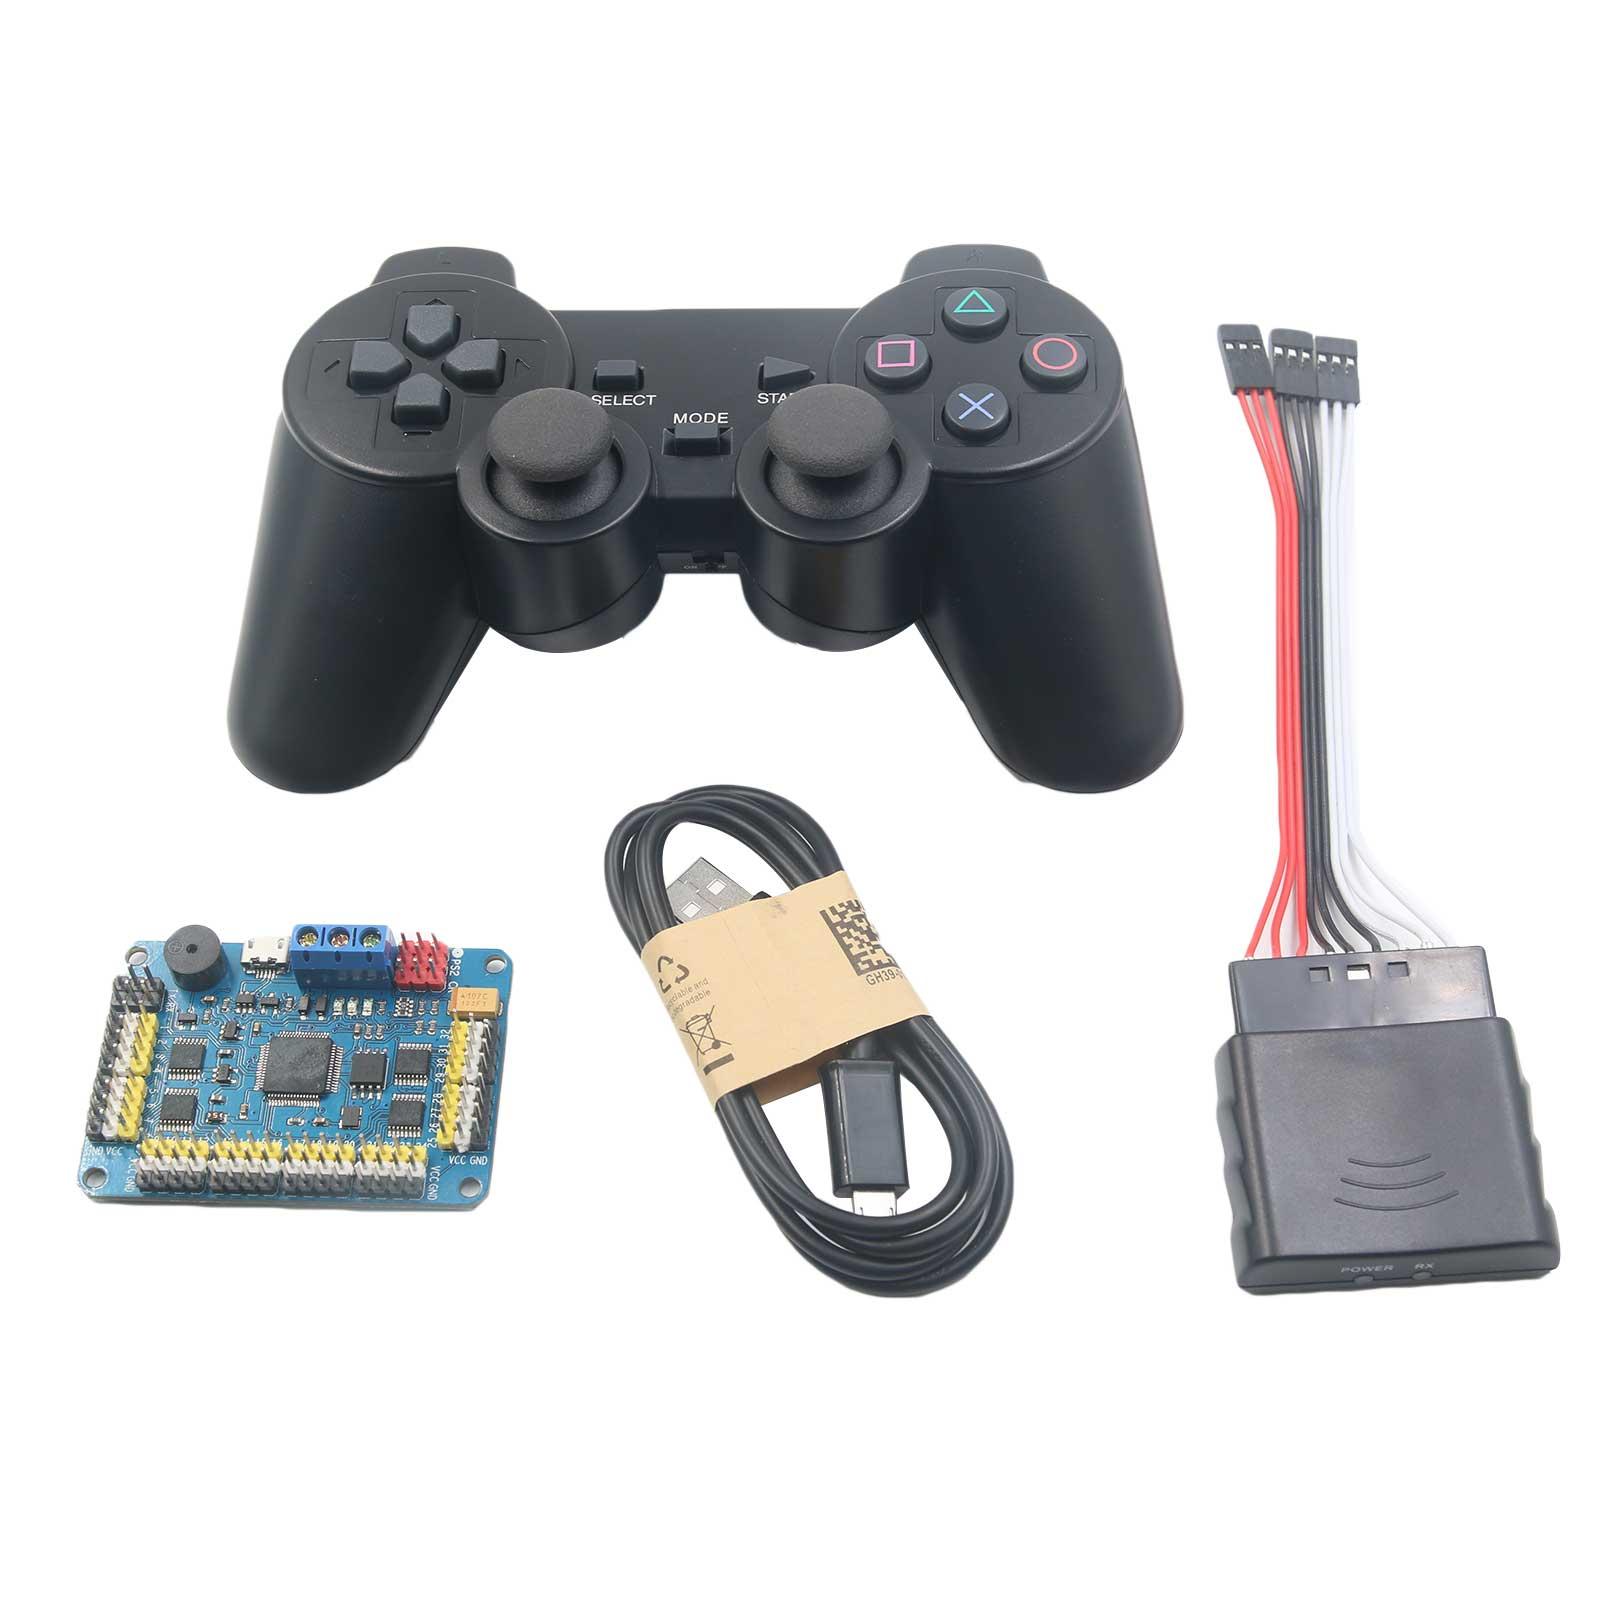 ФОТО 32 Channel Servo Control Board & Robot PS2 Controller & Receiver Handle for Arduino Robot DIY Platform